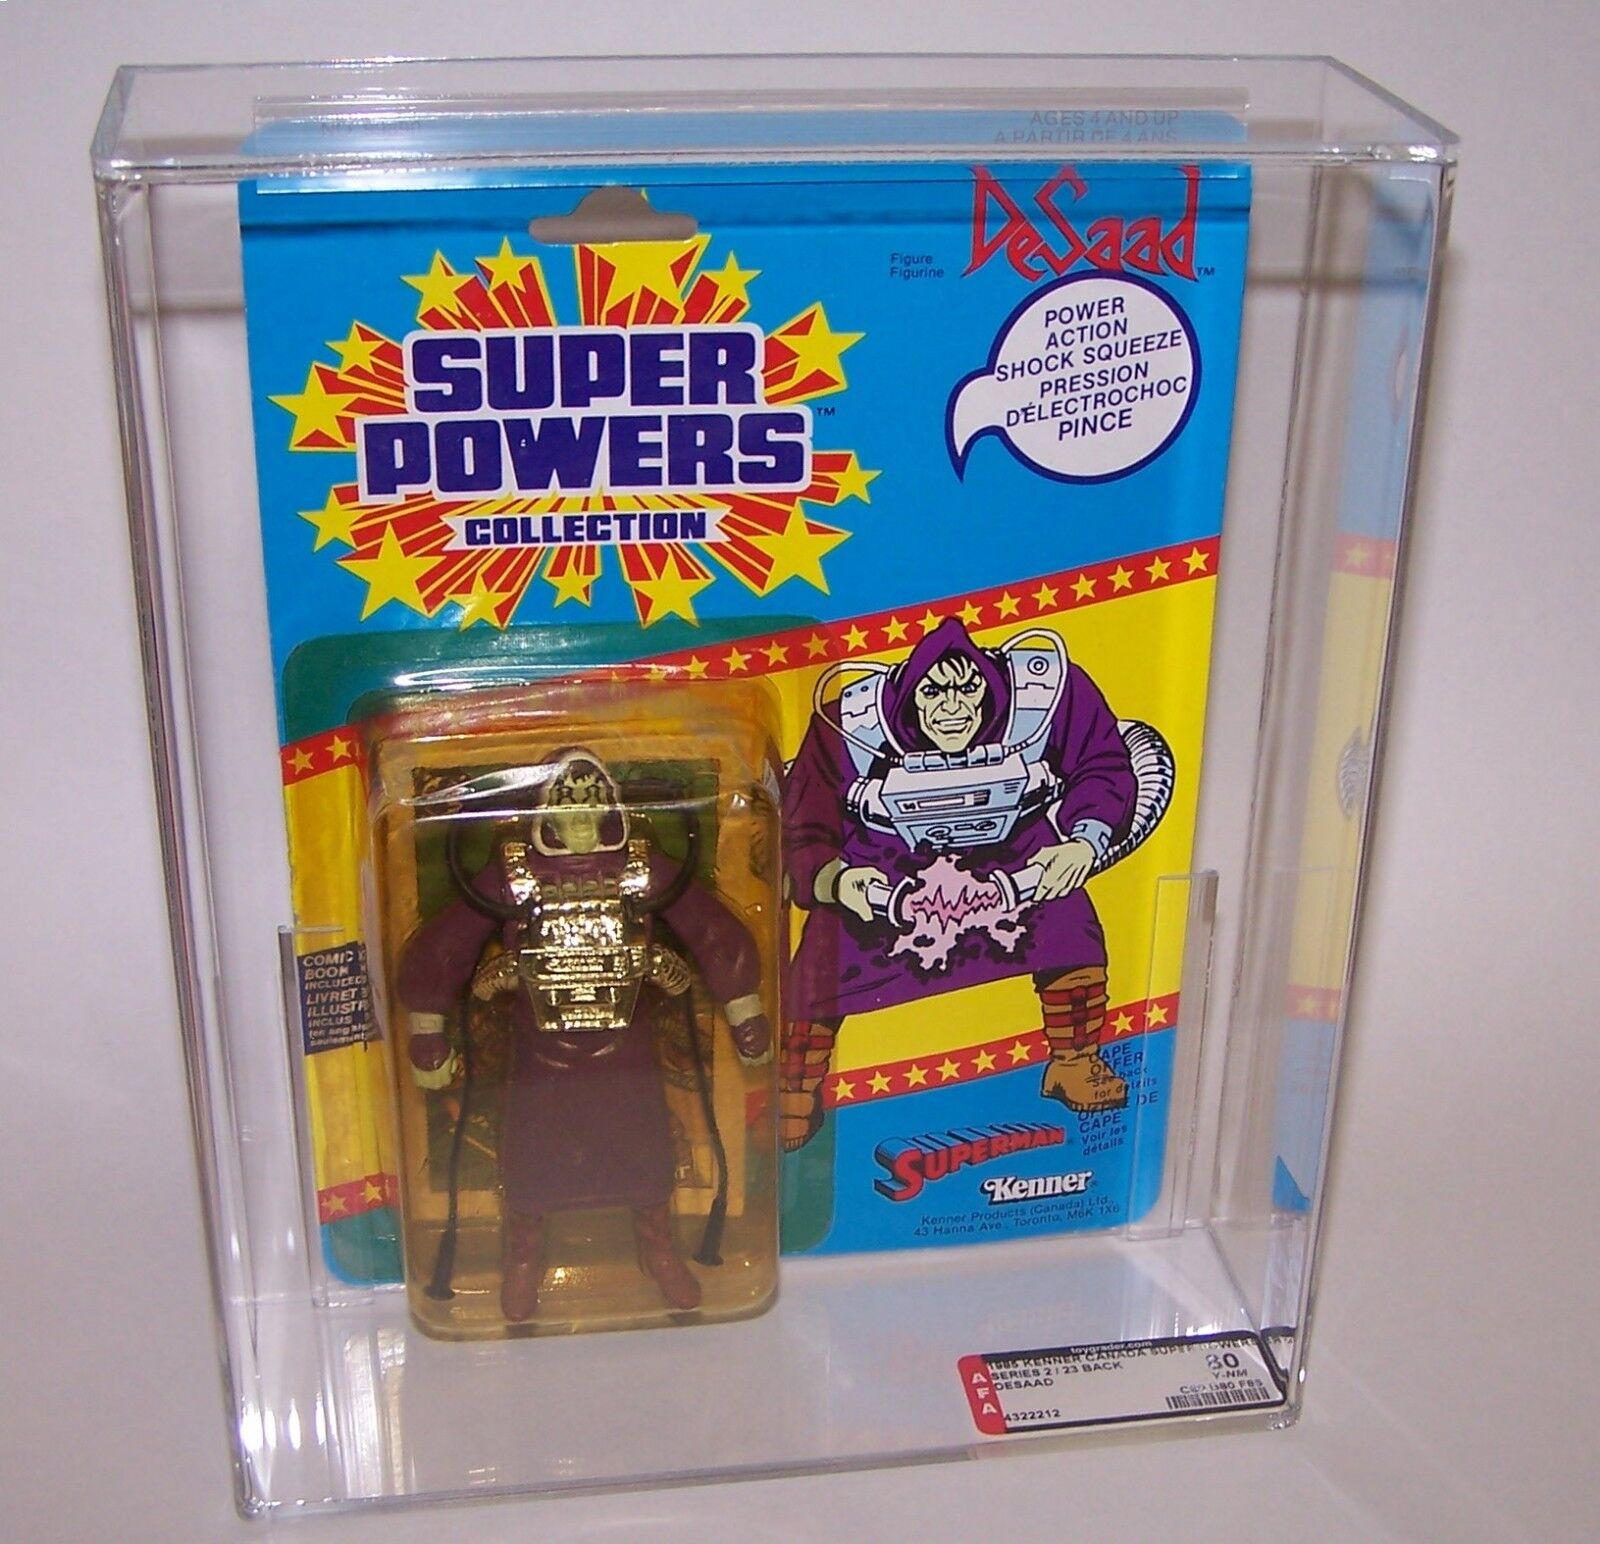 Super Powers Desaad Action Figure 1985 Kenner Graded AFA AFA AFA 80 Series 2 23 Can 2ddd1a